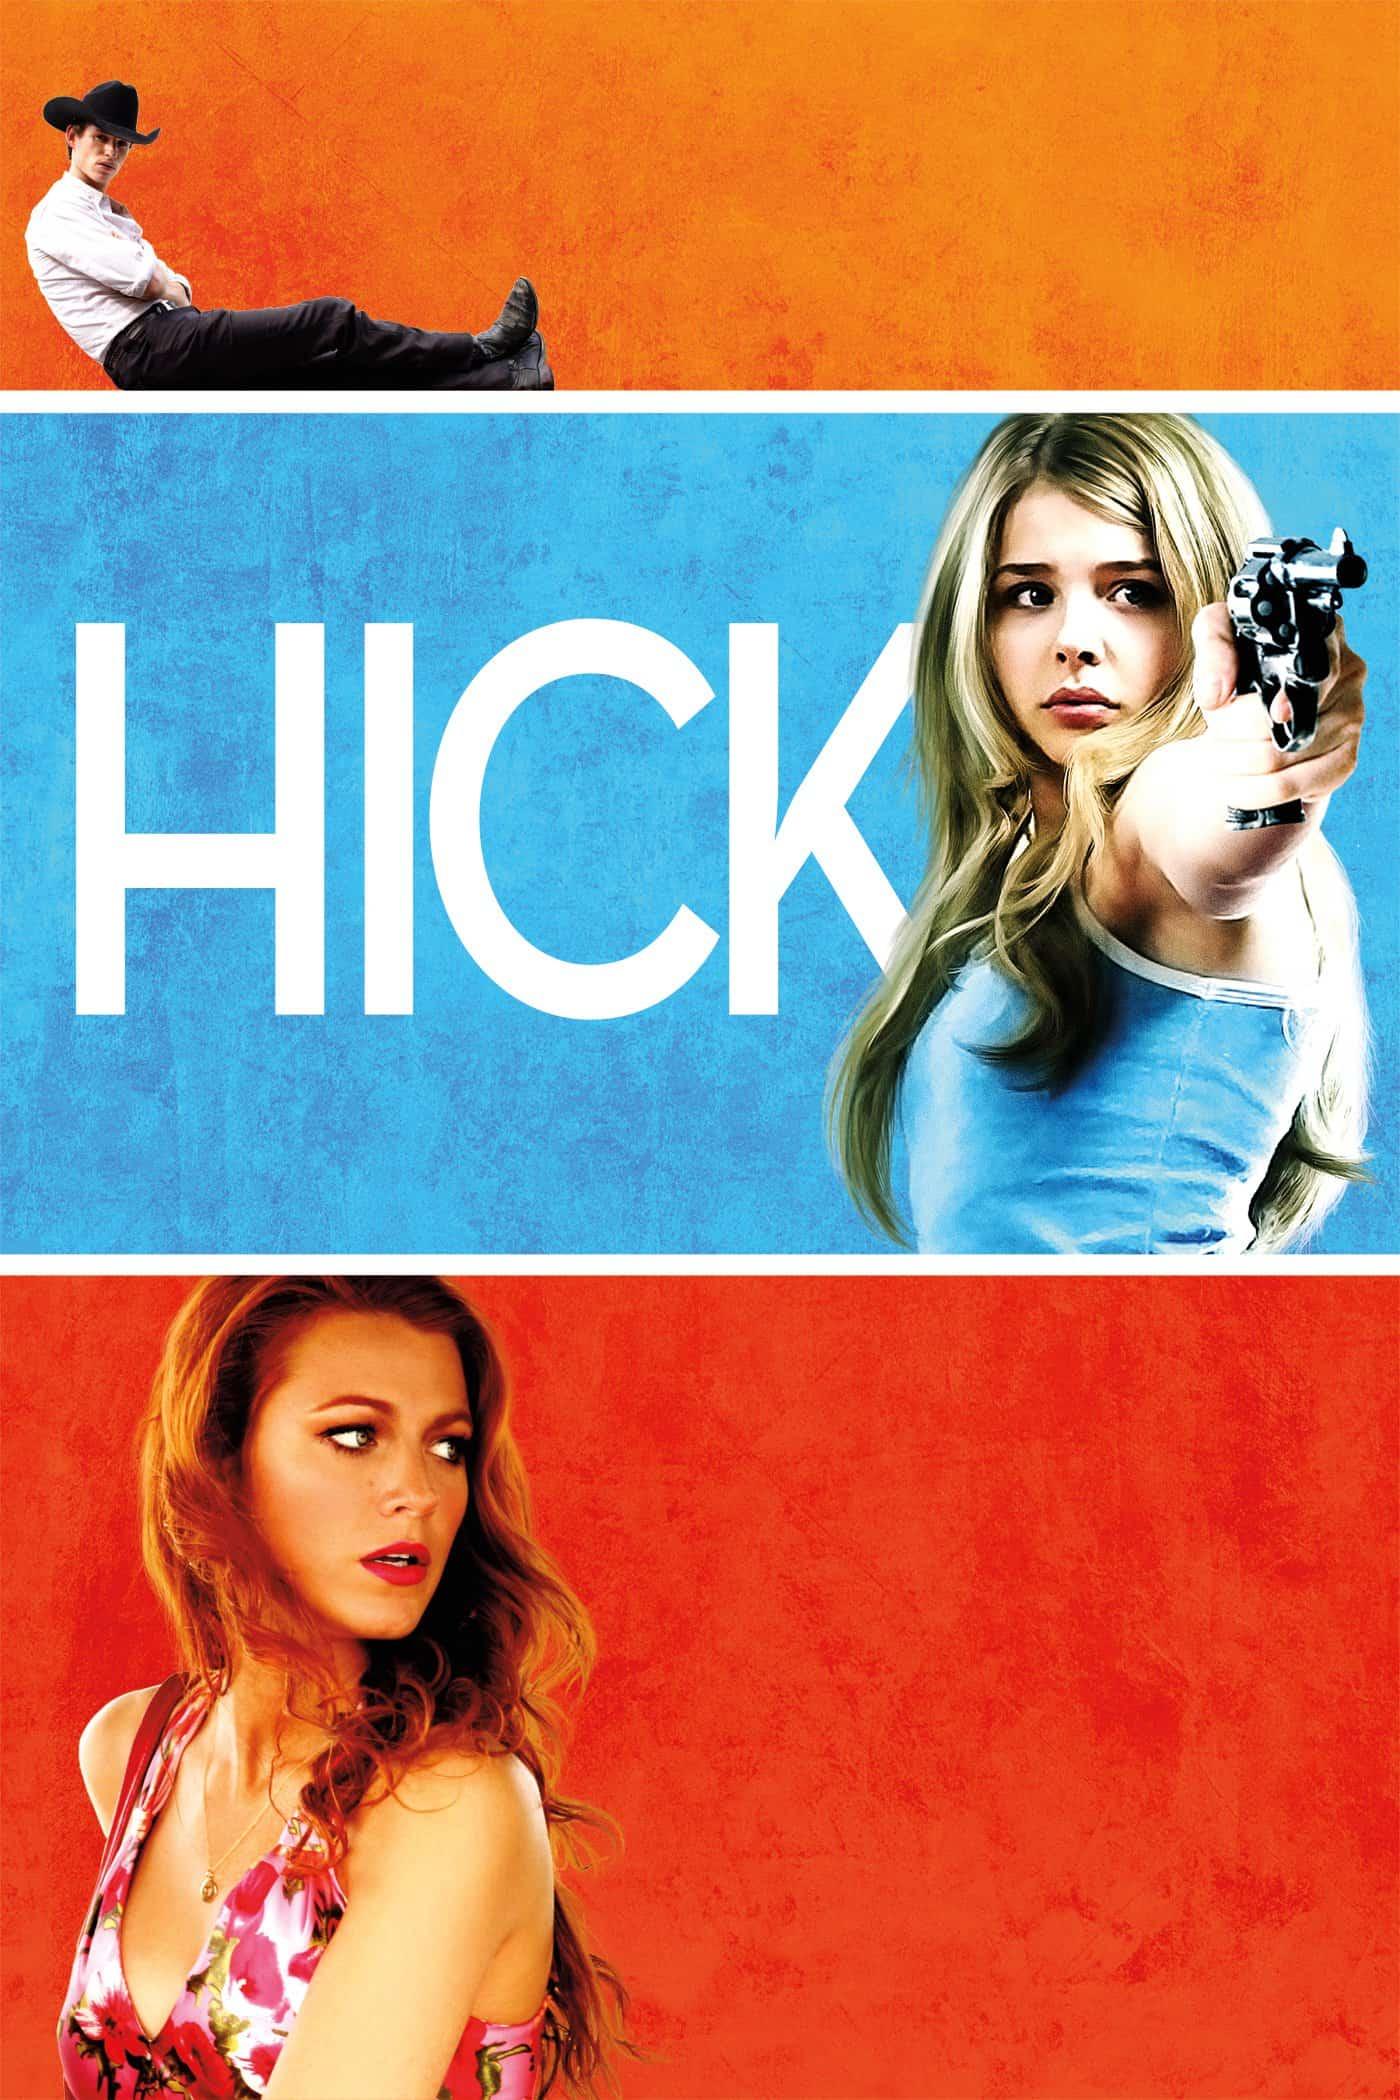 Hick, 2011